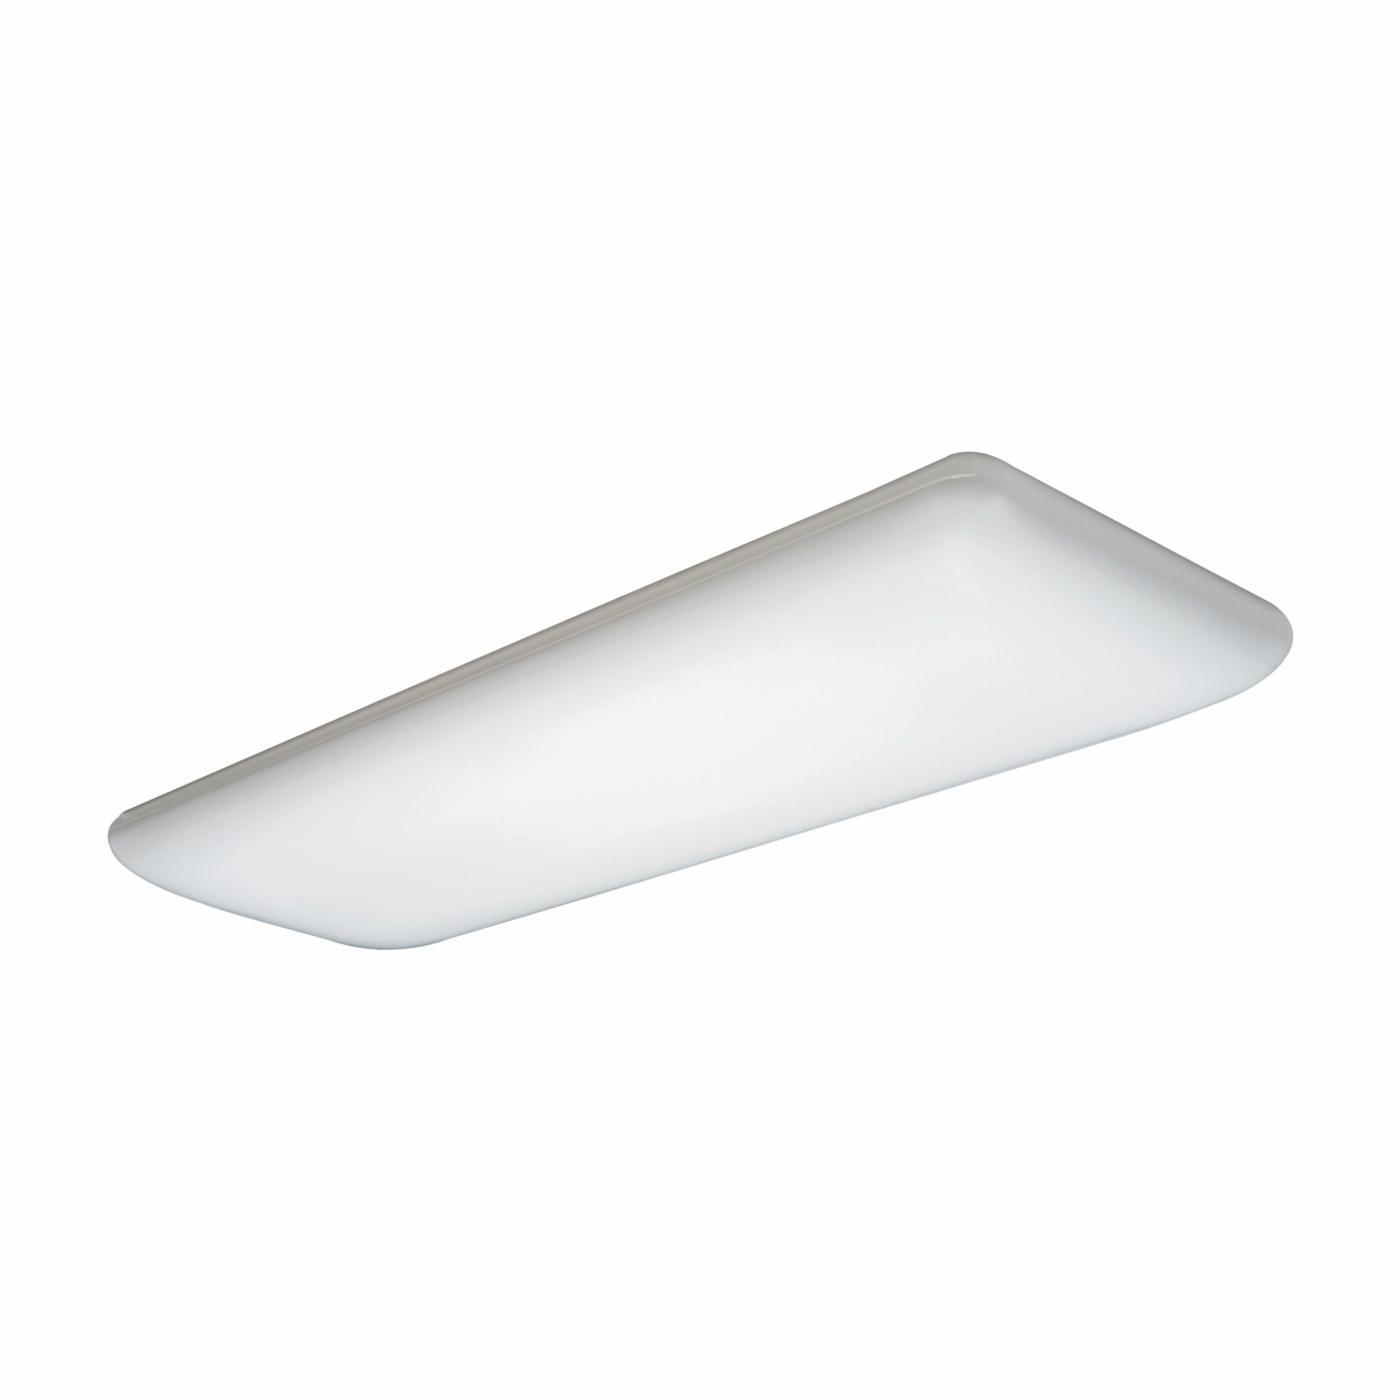 Lithonia Lighting 10642RE